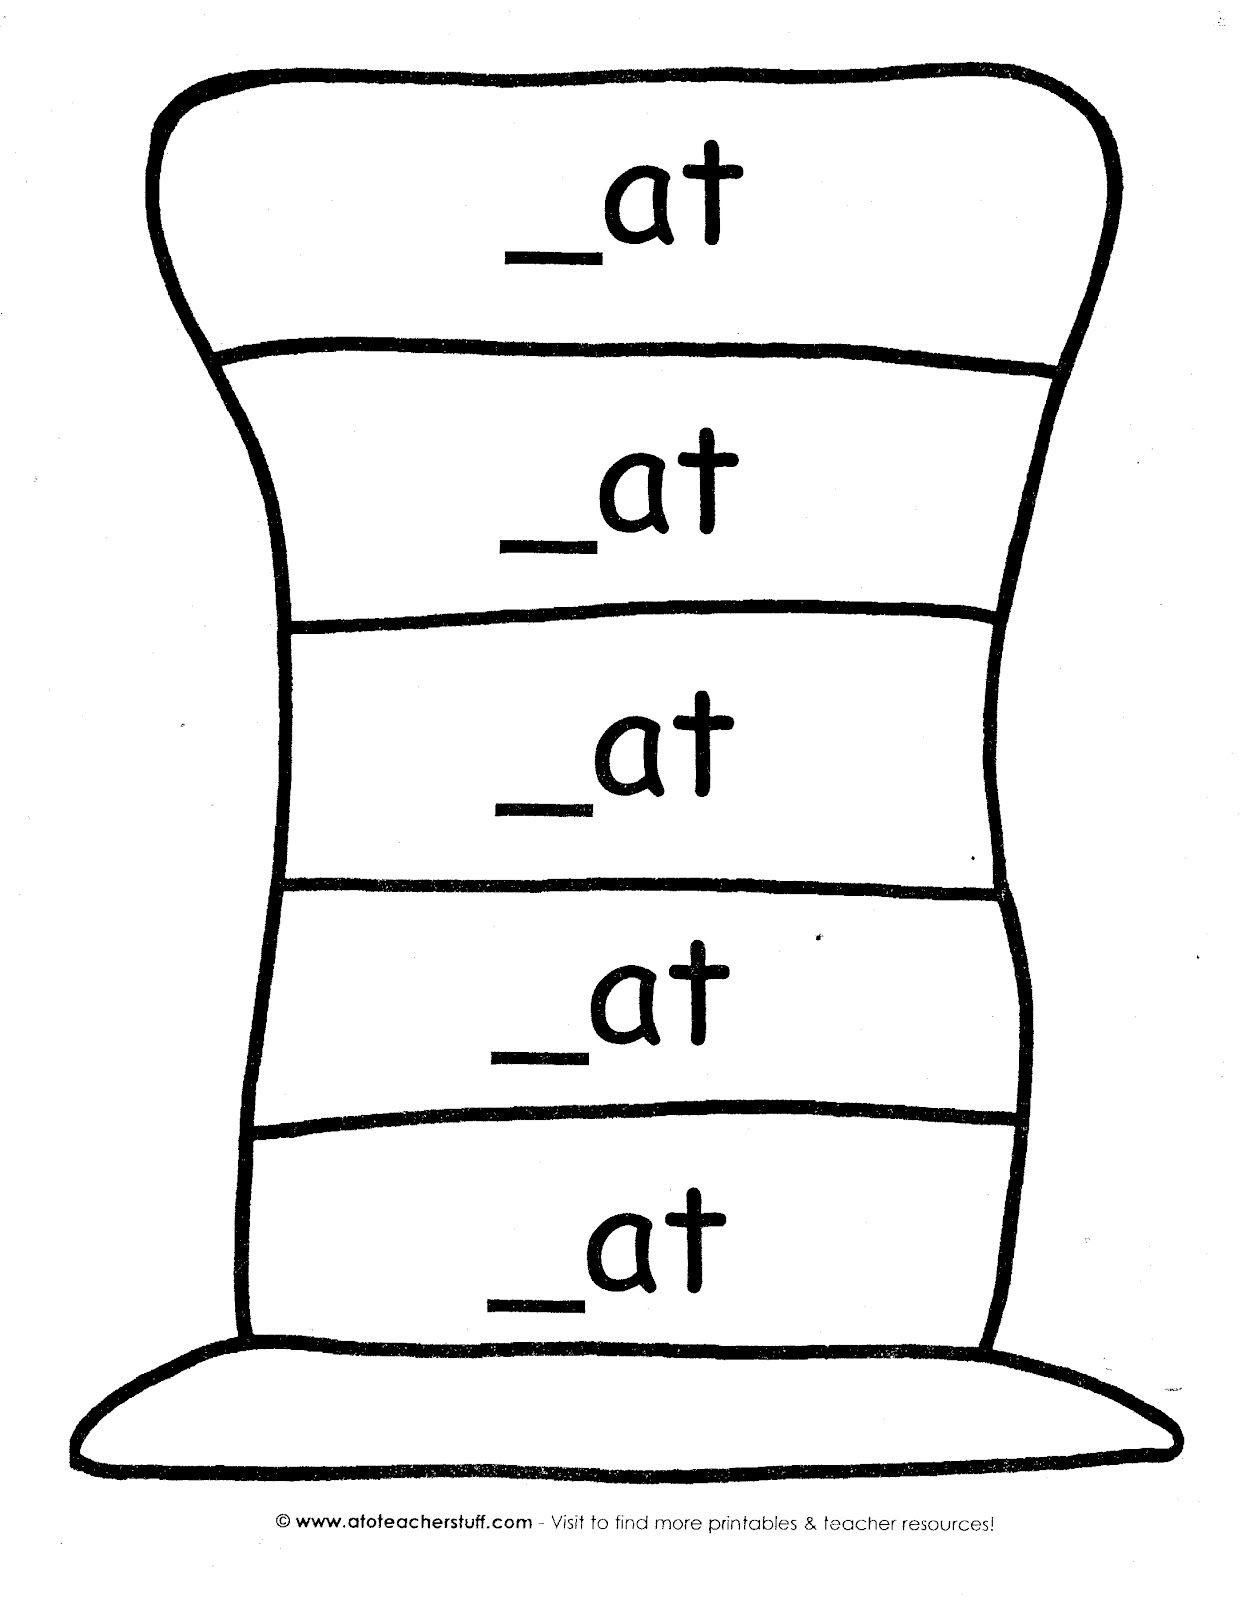 Free Printable Dr Seuss Worksheets – Worksheet Template - Free Printable Dr Seuss Math Worksheets